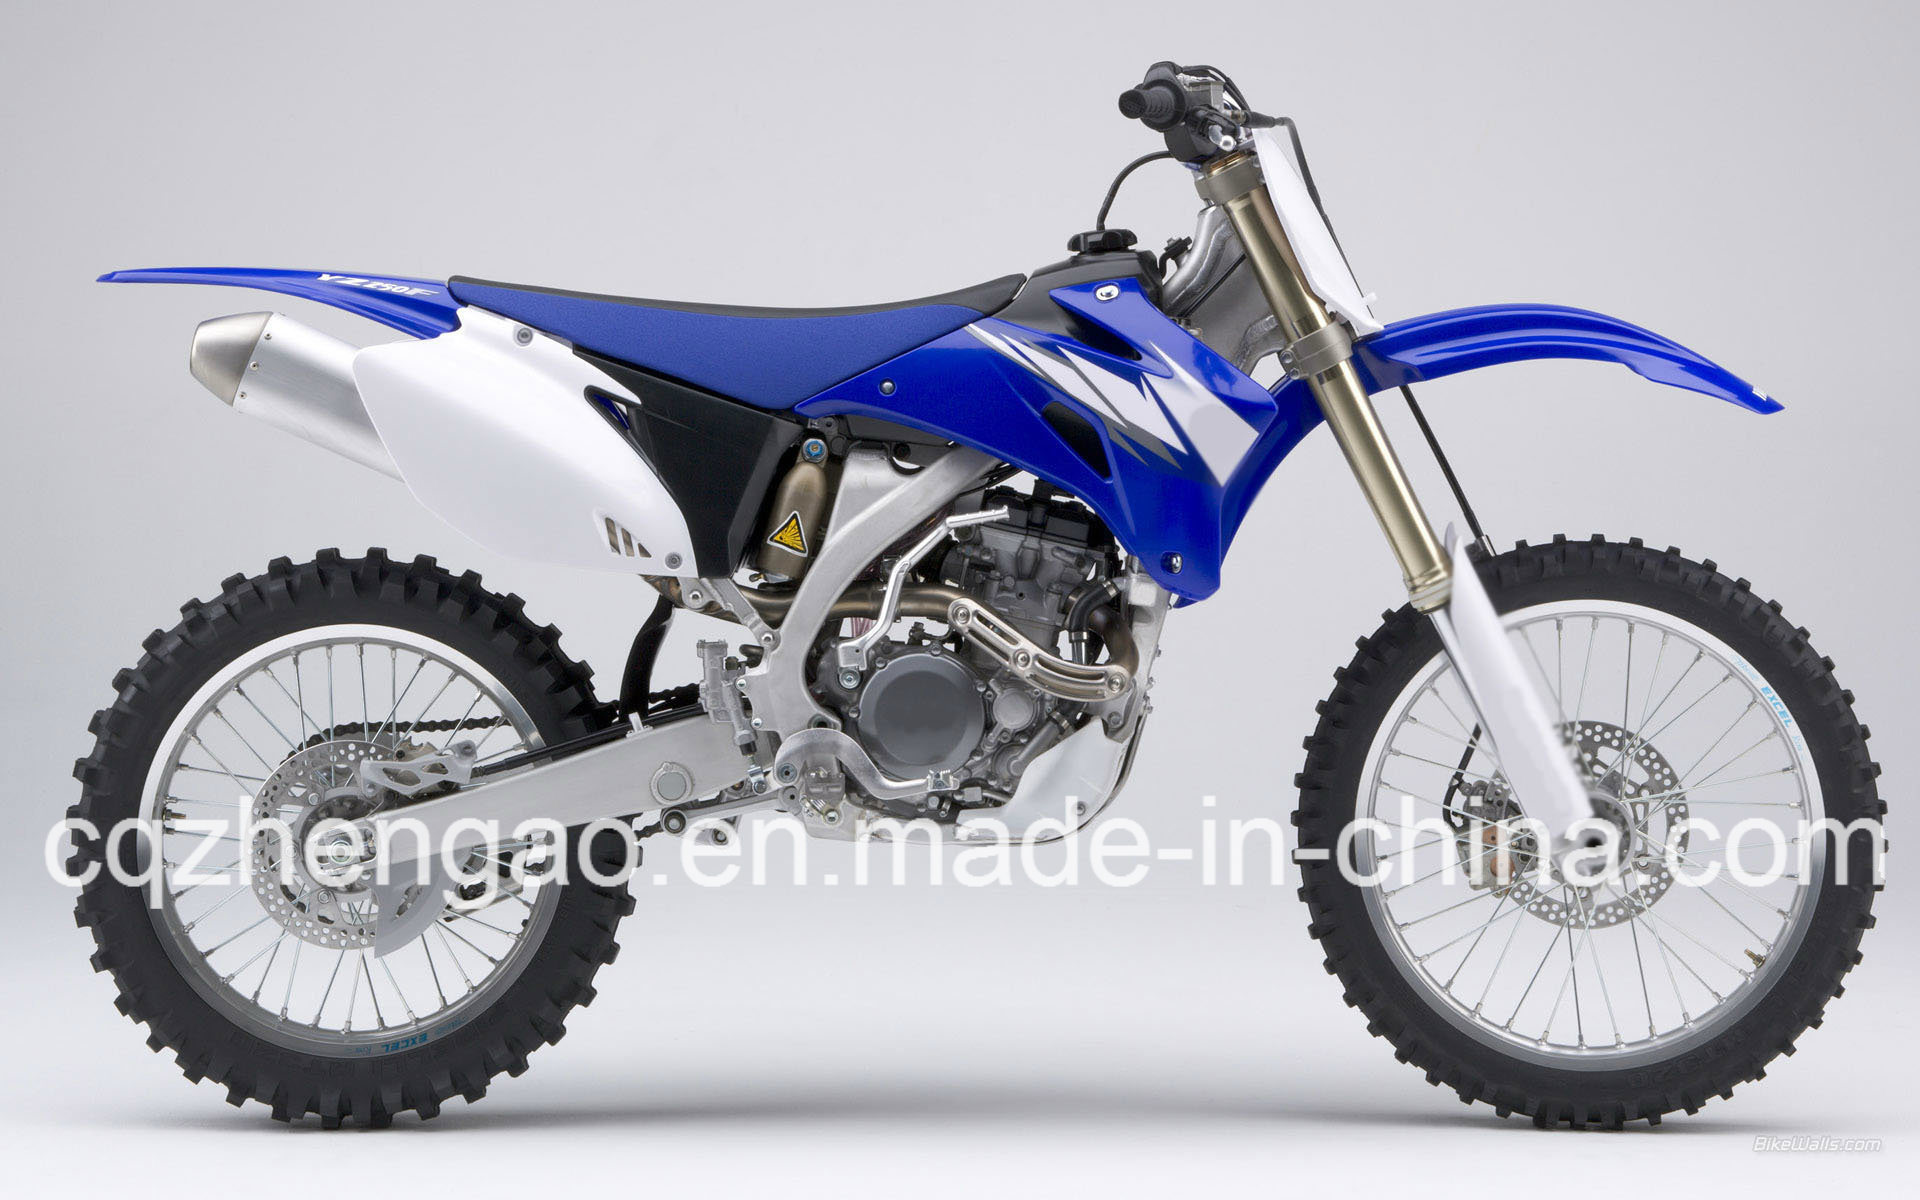 Nouveau 250cc dirt bike yamaha yz250 pour moto enduro et for Yamaha motorcycles made in china